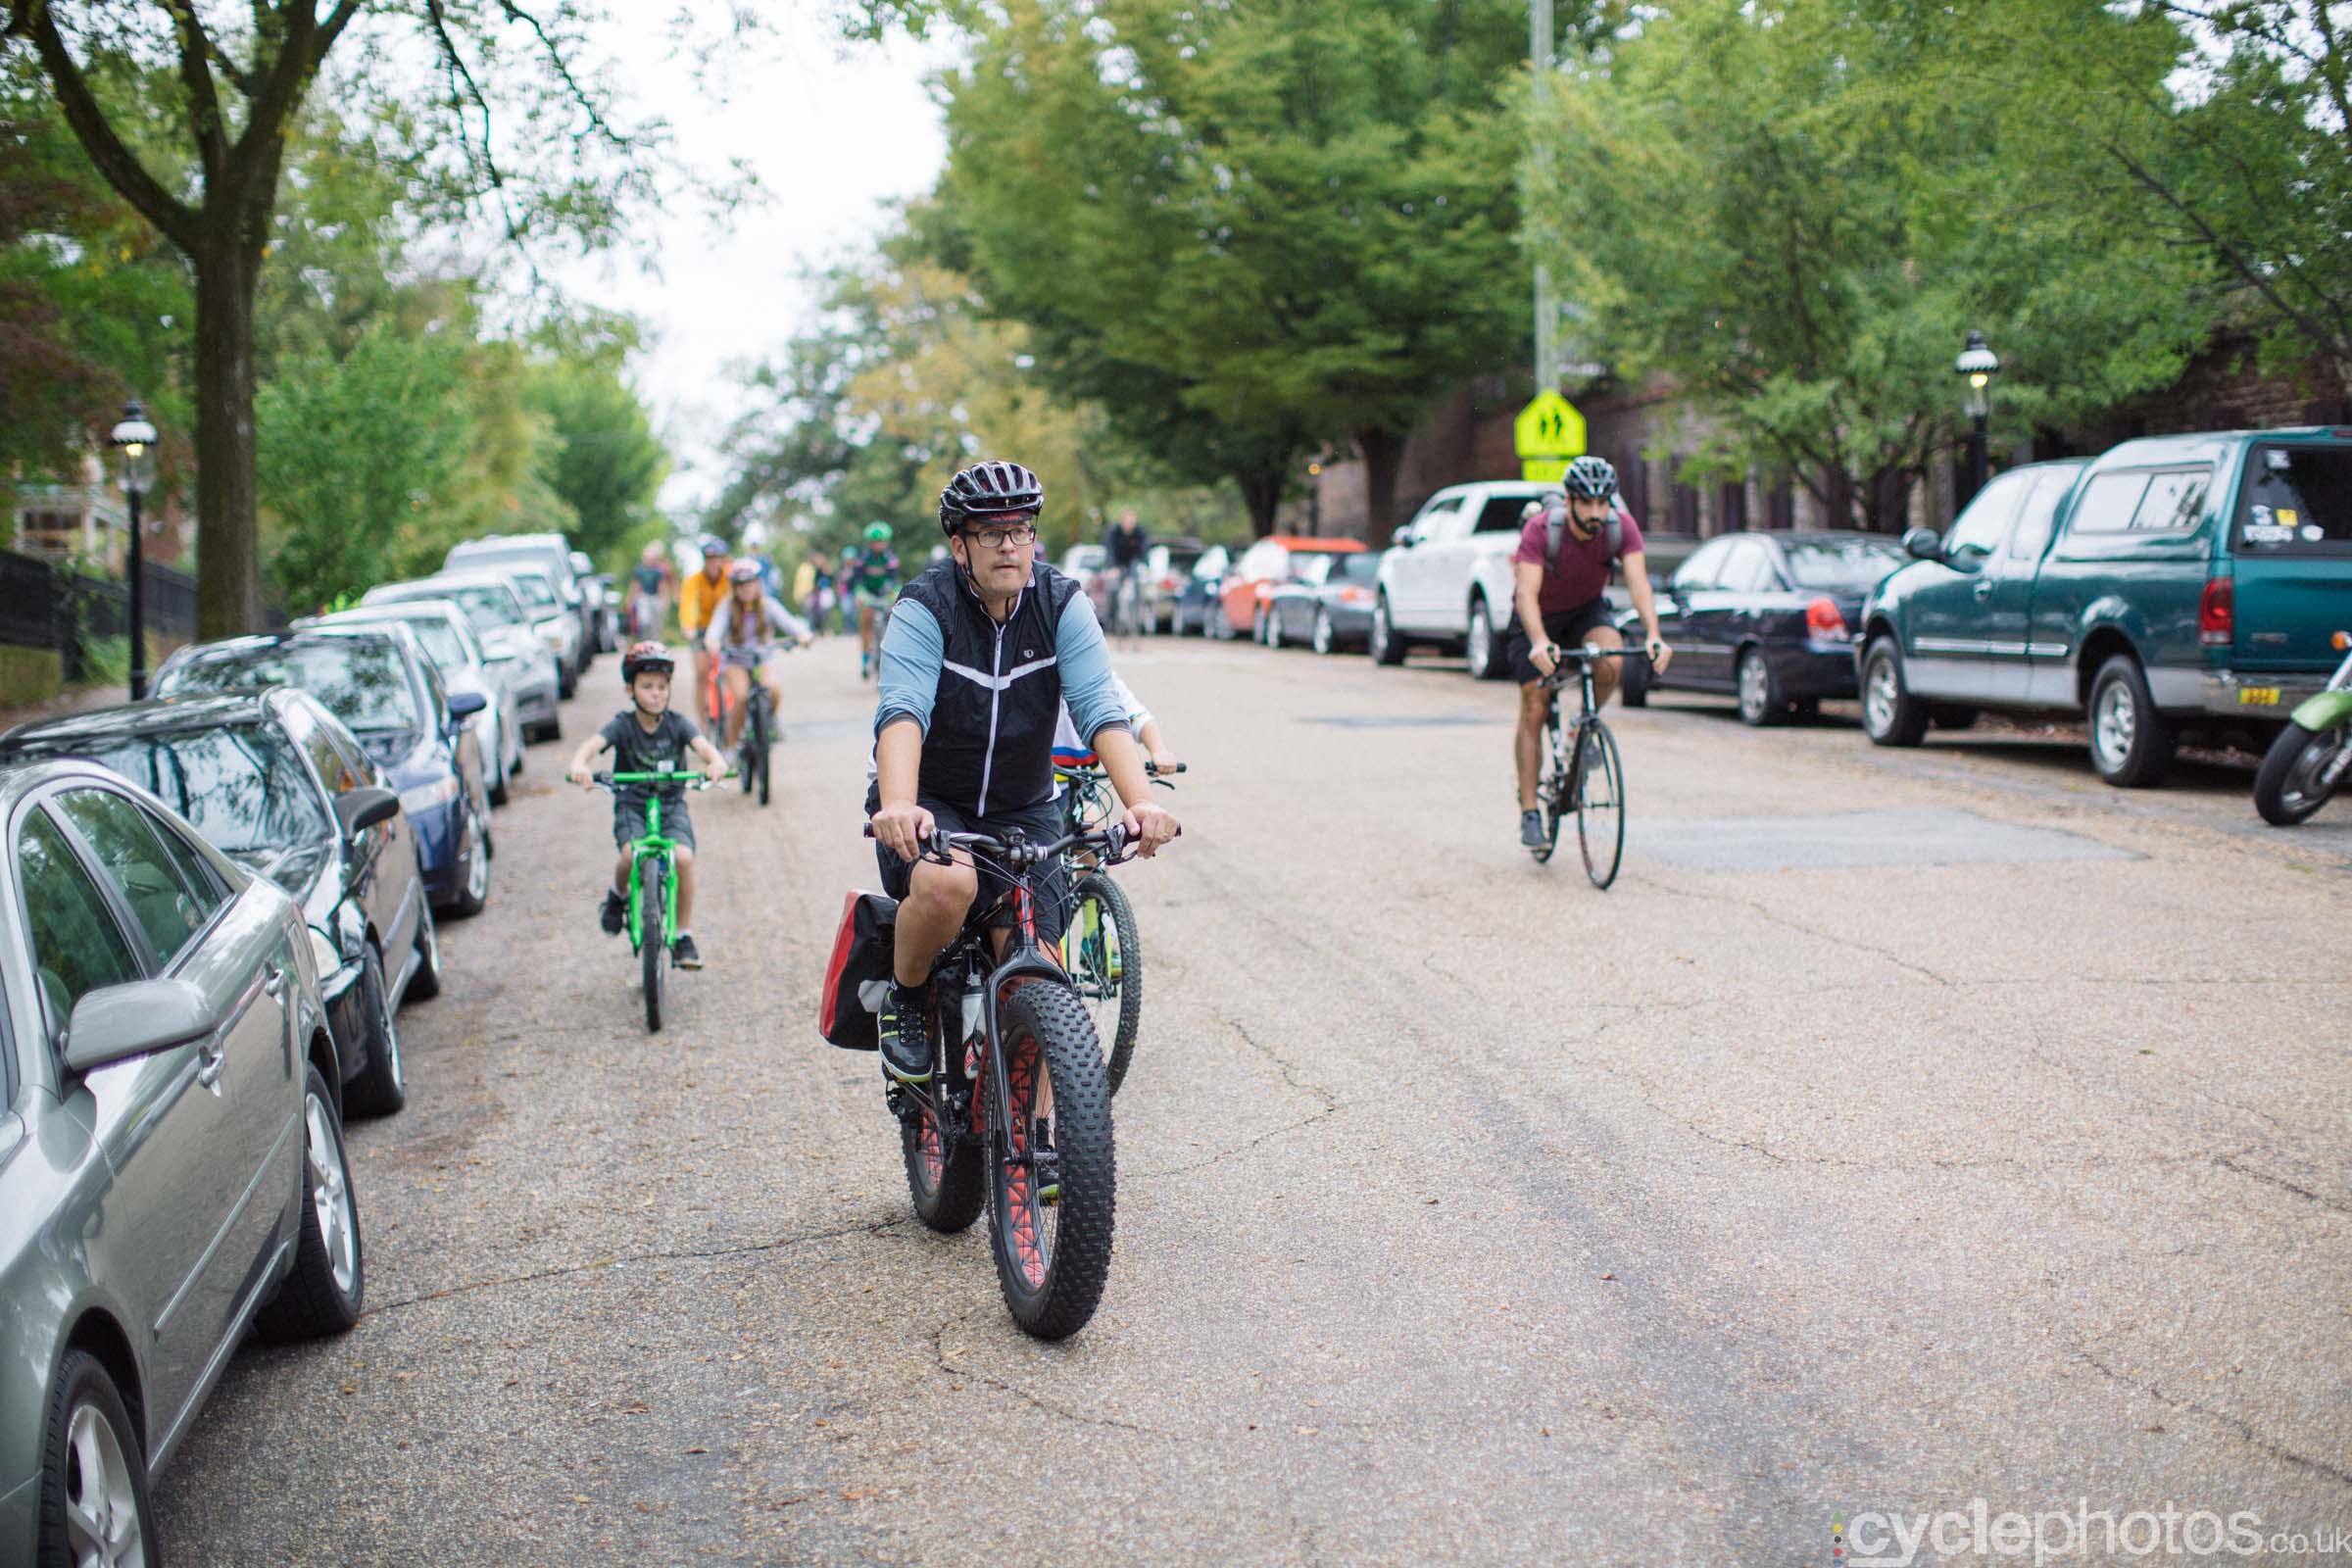 cyclephotos-world-champs-richmond-143945